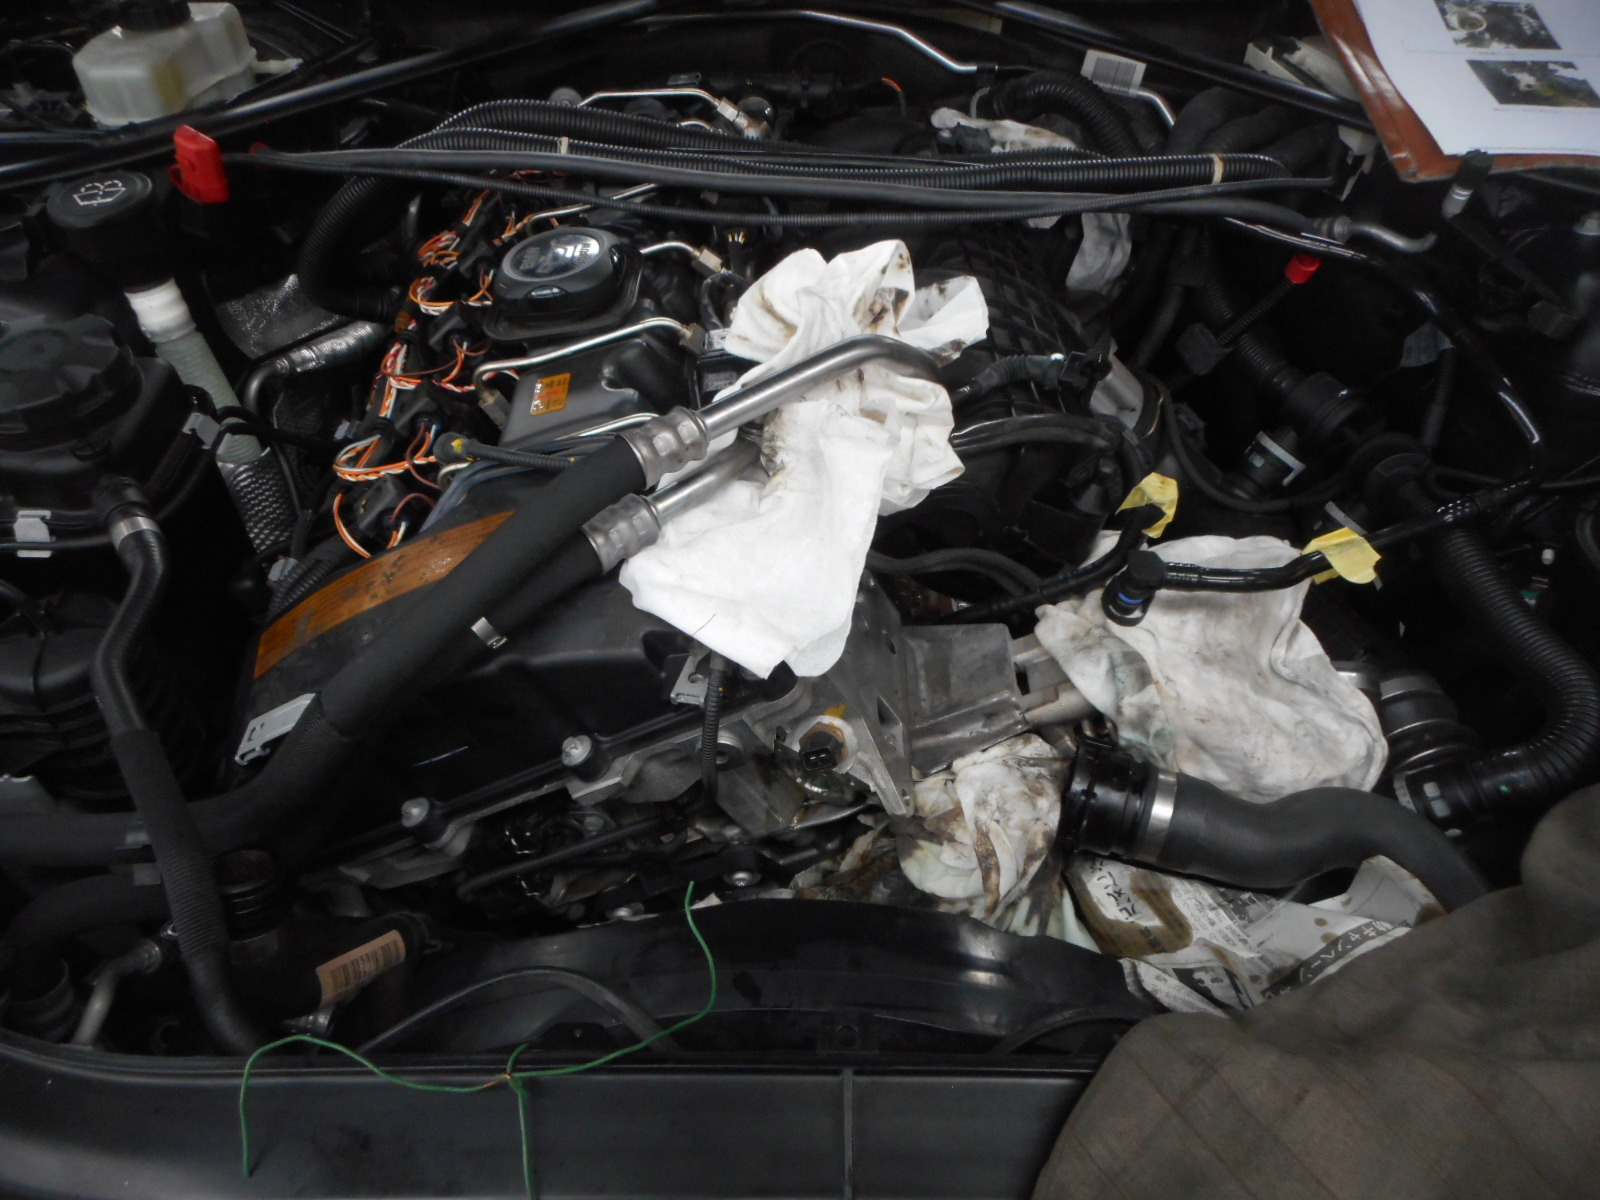 BMW335 クーペ (E90) エンジンオイル漏れ修理 納車整備_c0267693_17110365.jpg